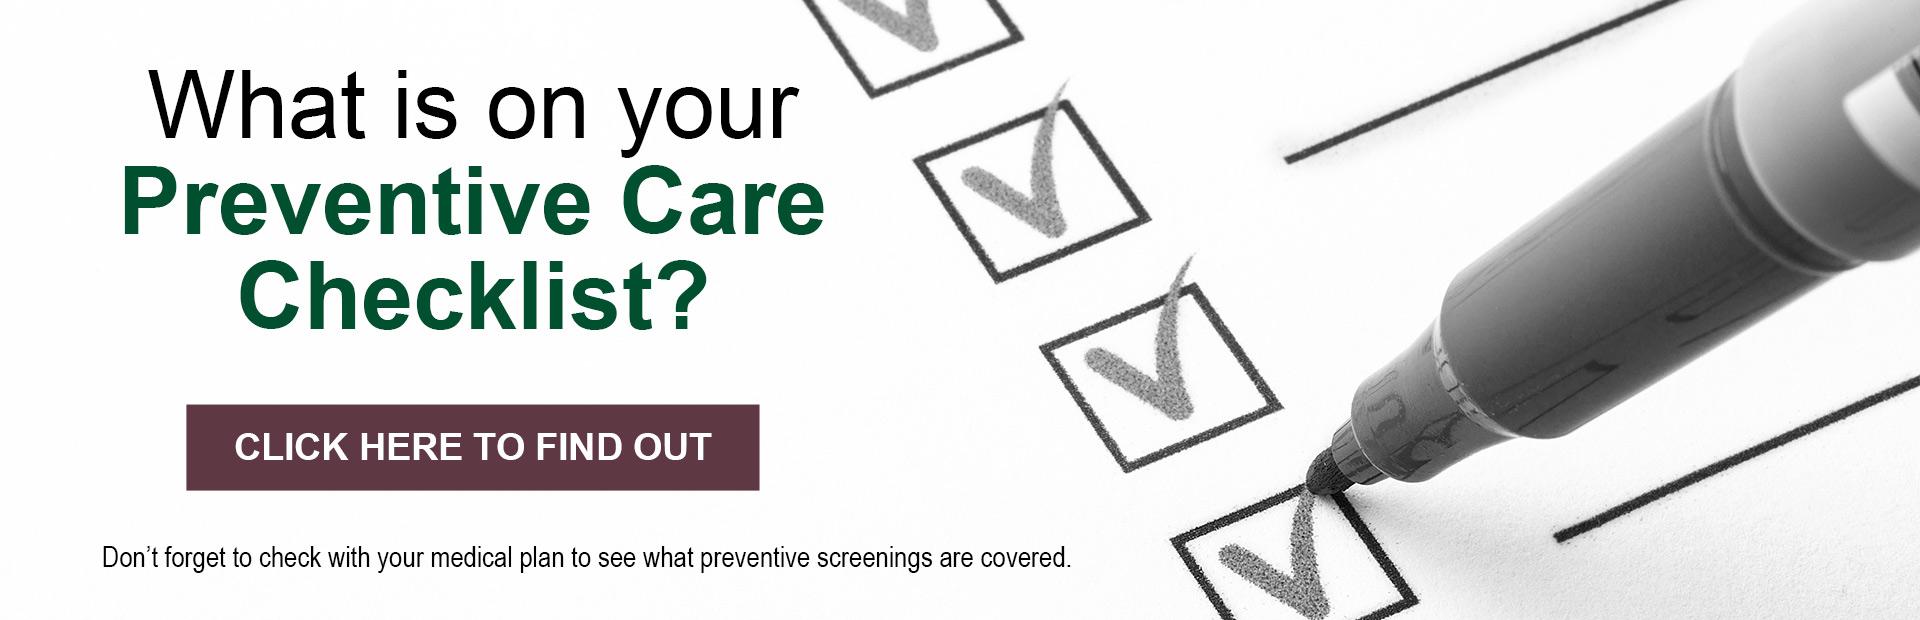 OSI-Preventive-Care-Checklist-Slider-rev